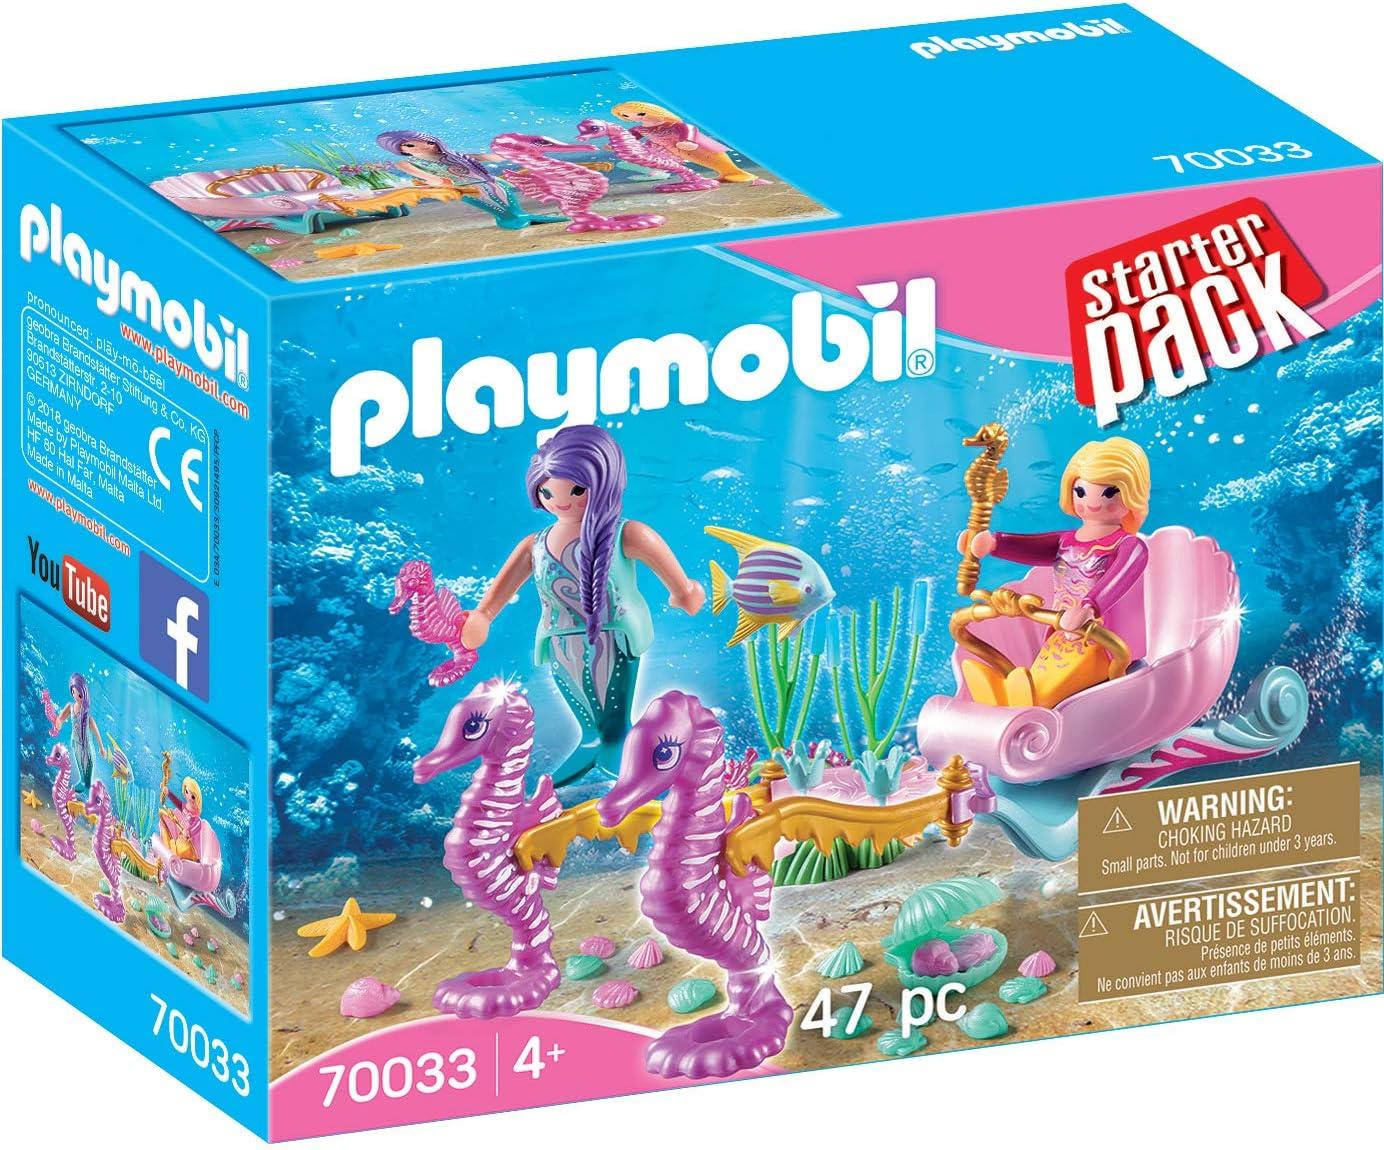 Amazon.com: PM Playmobil 70033 - Pack de accesorios para ...